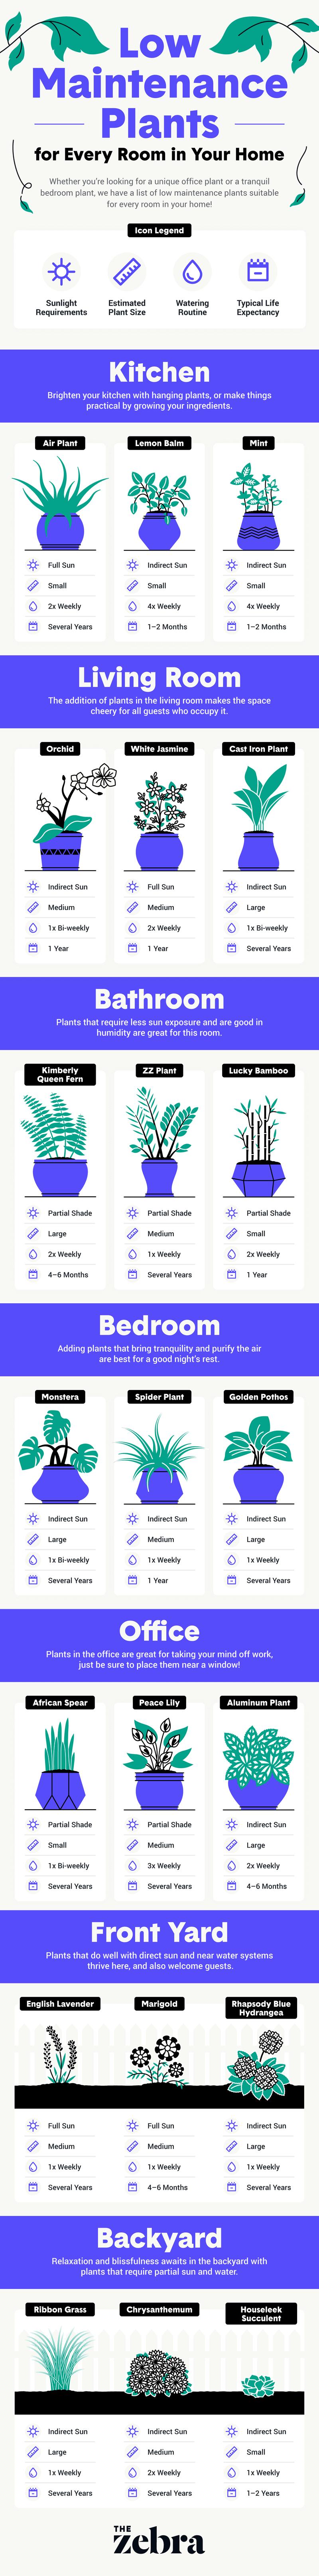 Low Maintenance Plants